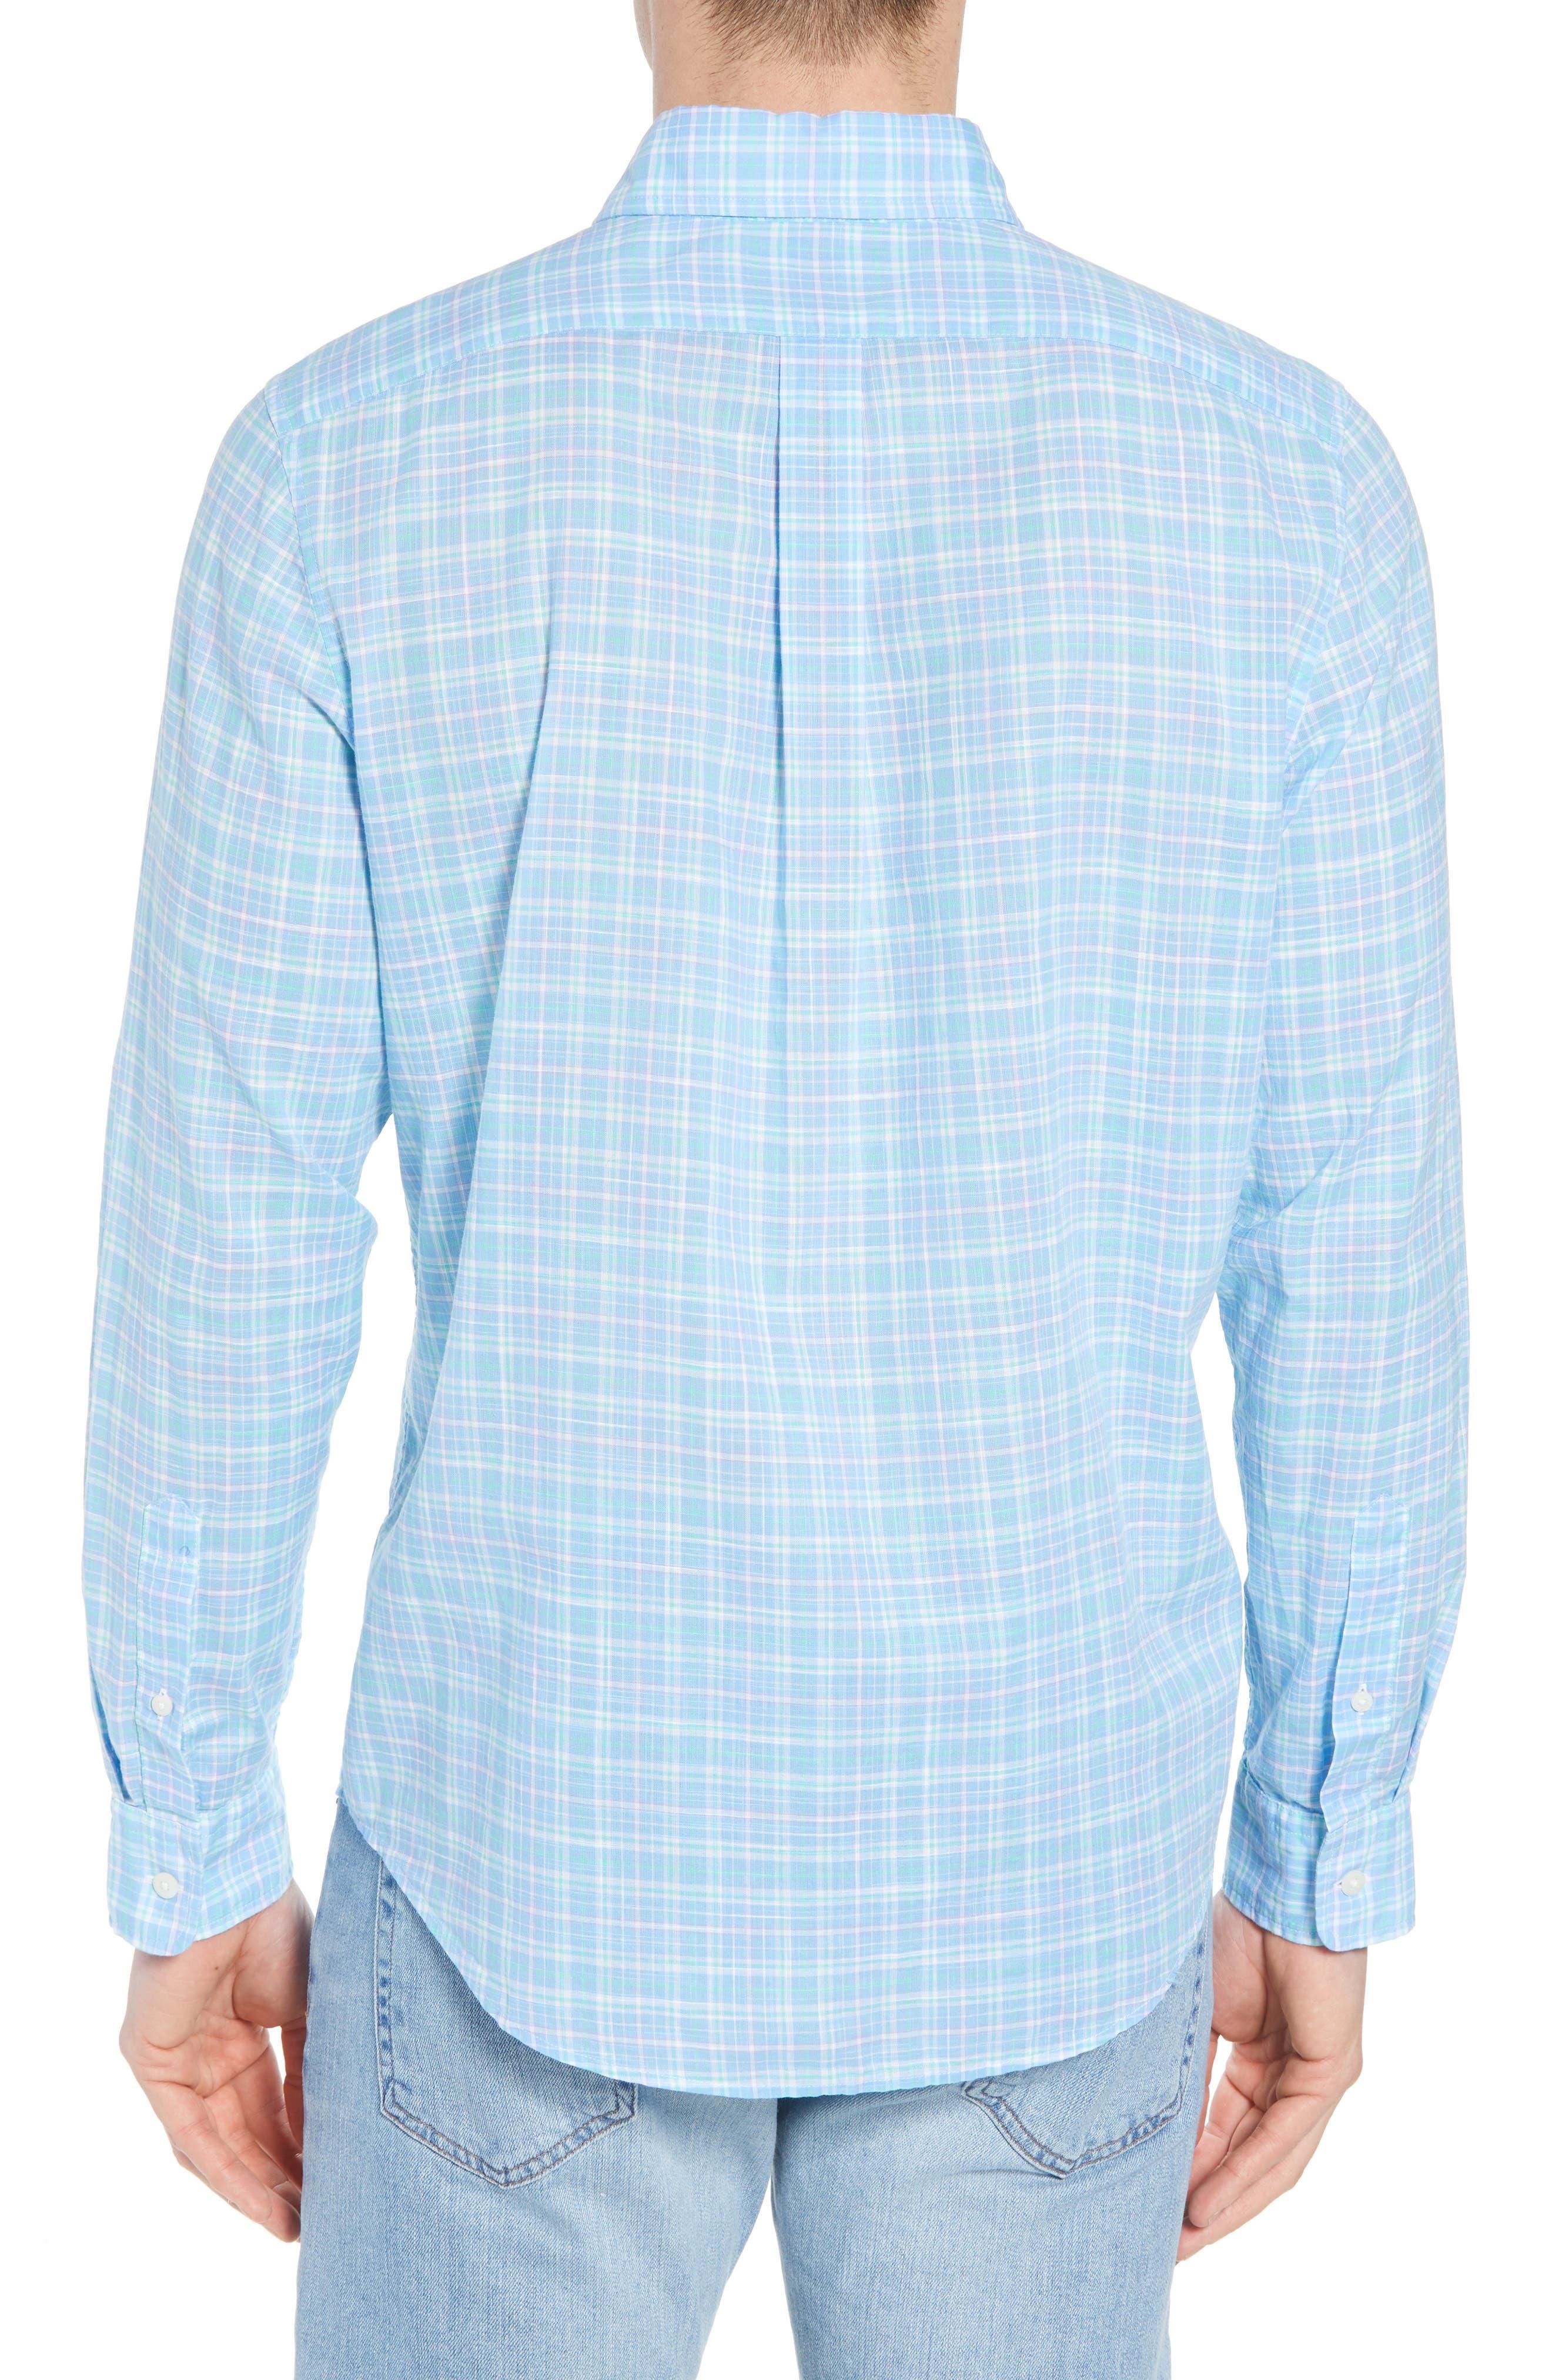 Stoney Hill Tucker Classic Fit Plaid Sport Shirt,                             Alternate thumbnail 3, color,                             415